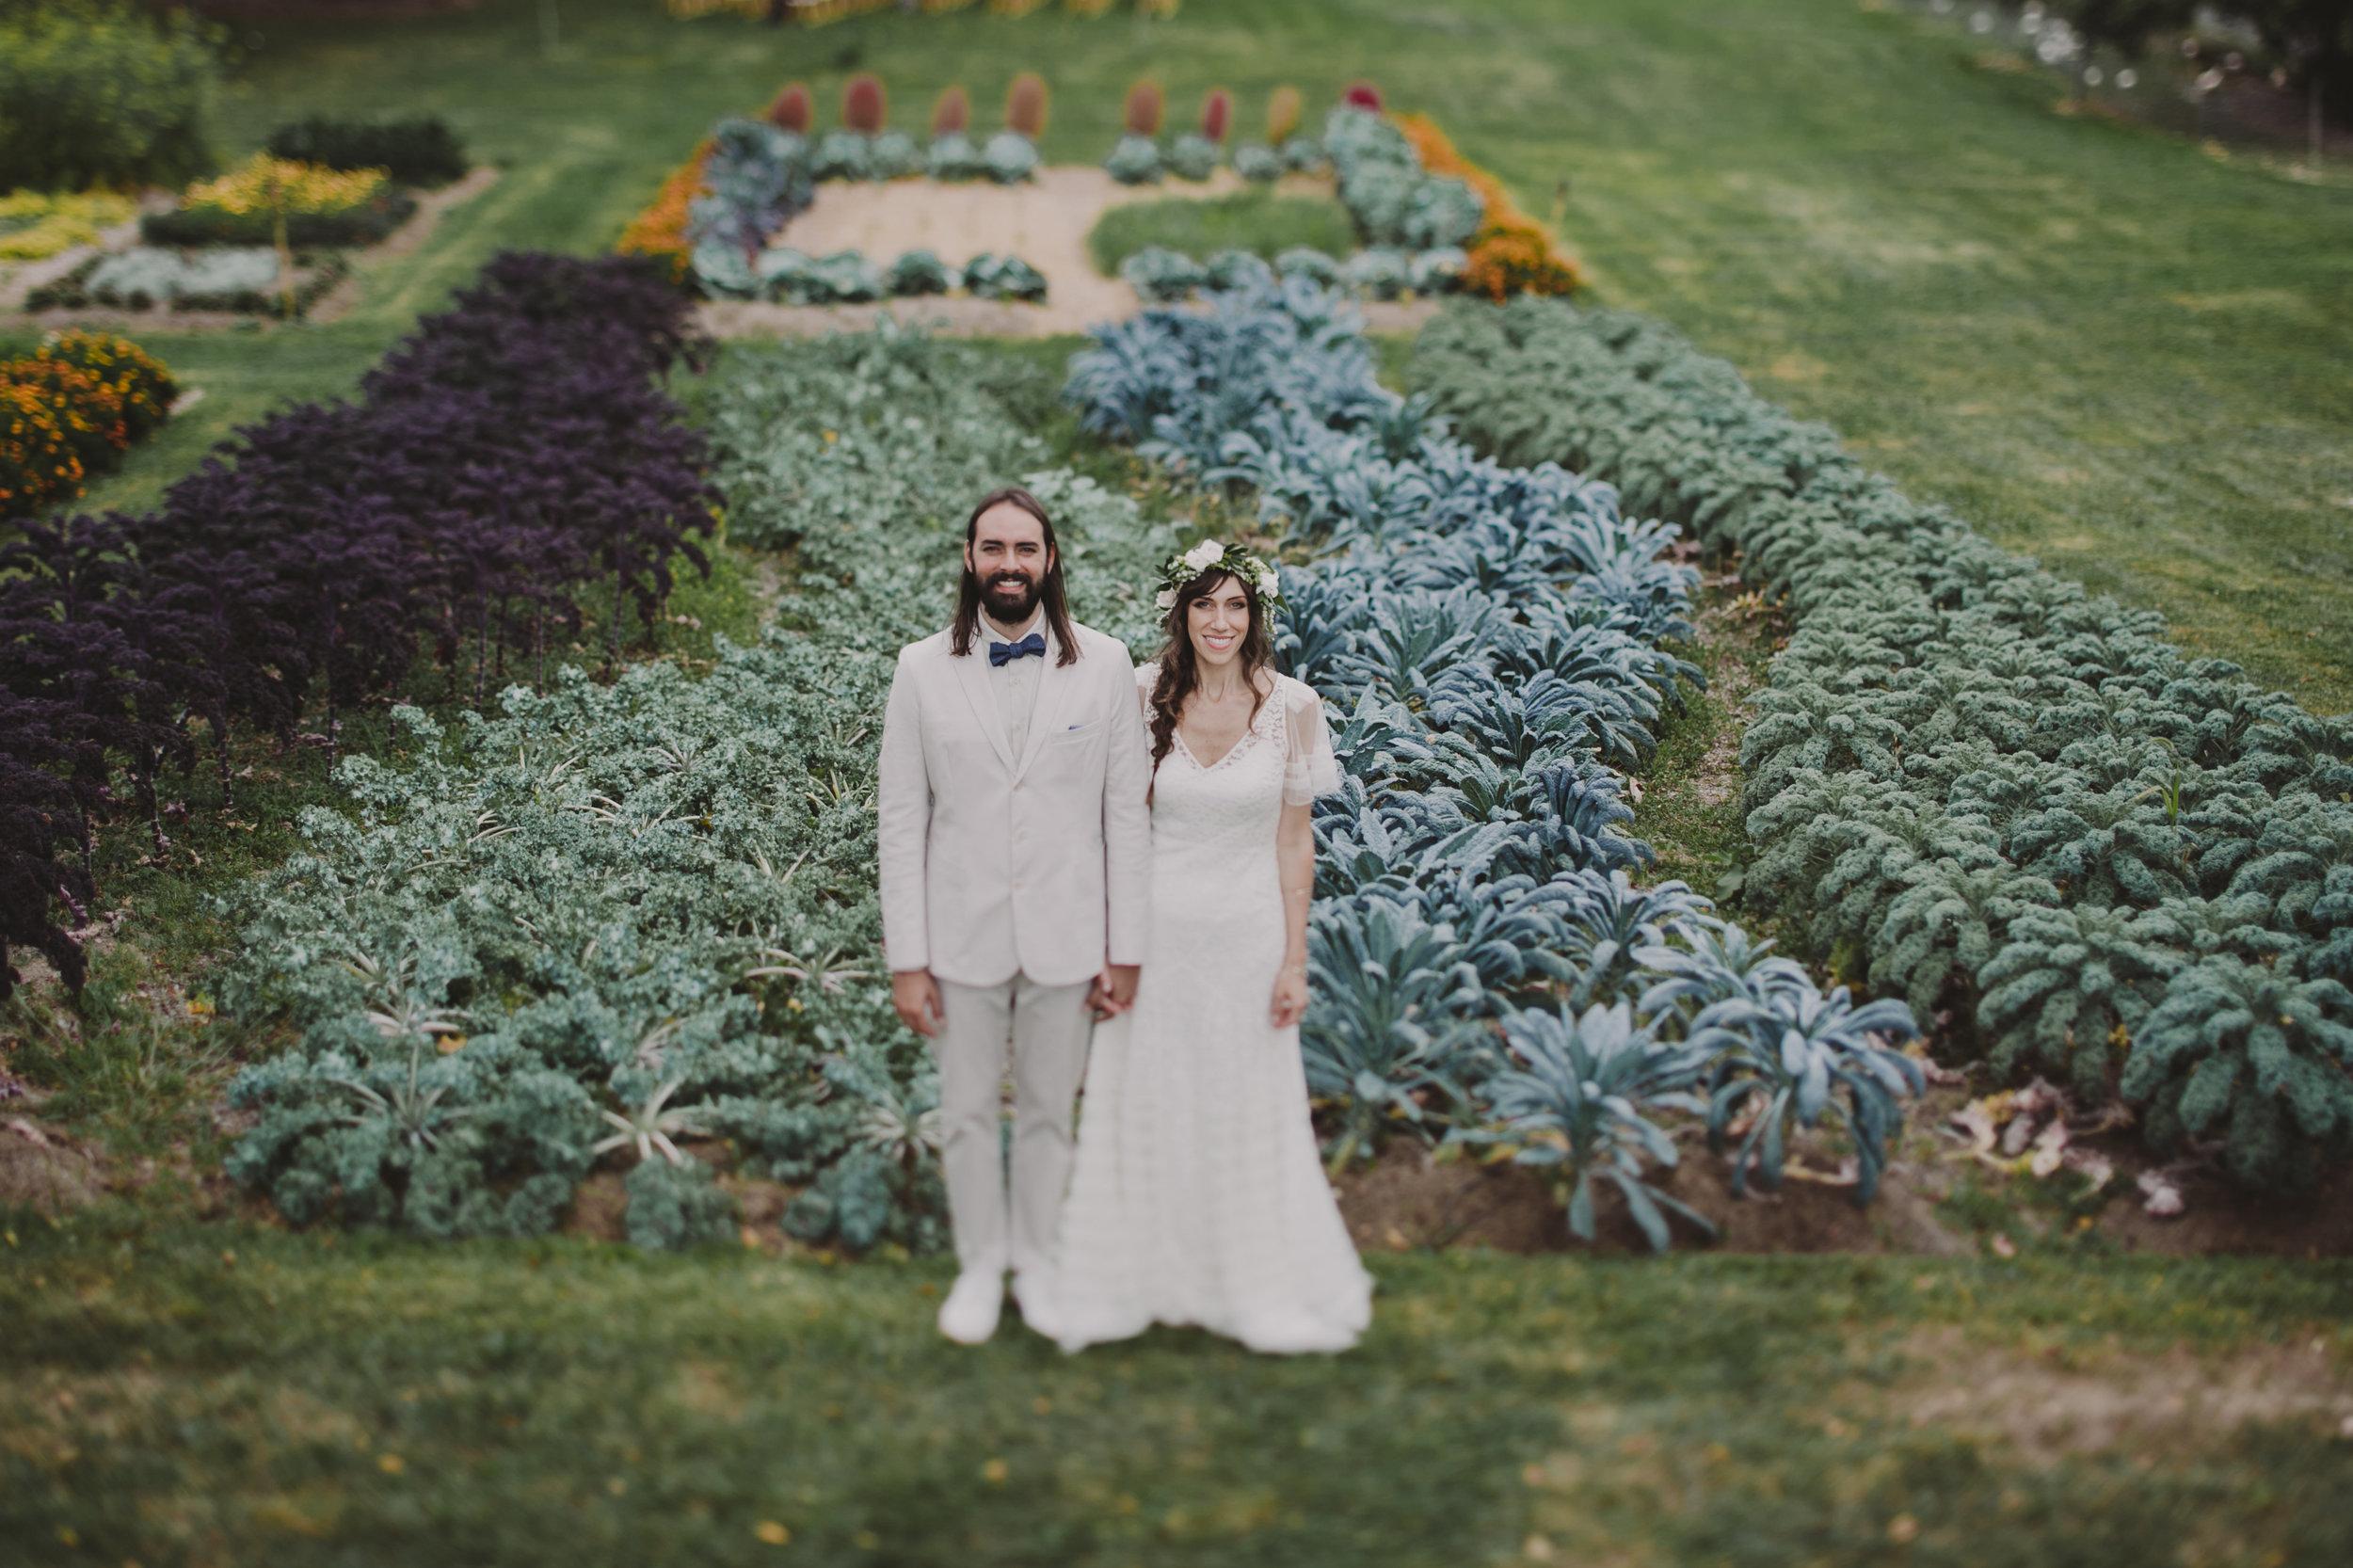 LIBERTY_VIEW_FARM_HIGHLAND_NY_WEDDING_CHELLISE_MICHAEL_PHOTOGRAPHY808.JPG